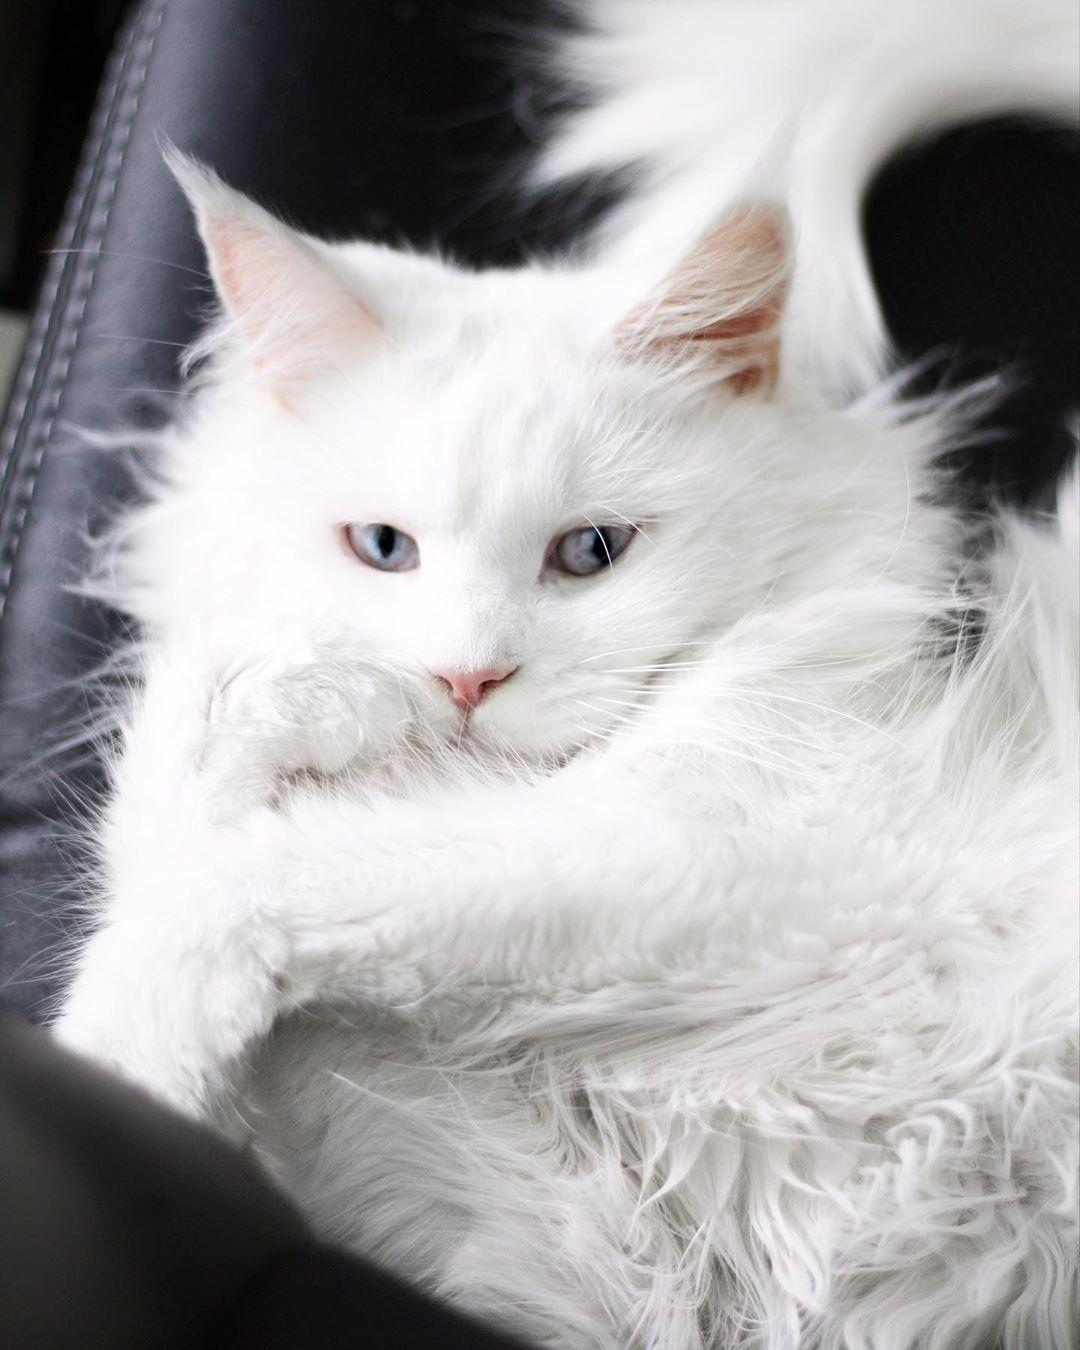 Impossible To Resist Her Nala Balousfriends Bestcats Oftheworld Blueeyedcat Cat Catlover Catofinstagram Catphoto Cats Features Catsofinstagram Di 2020